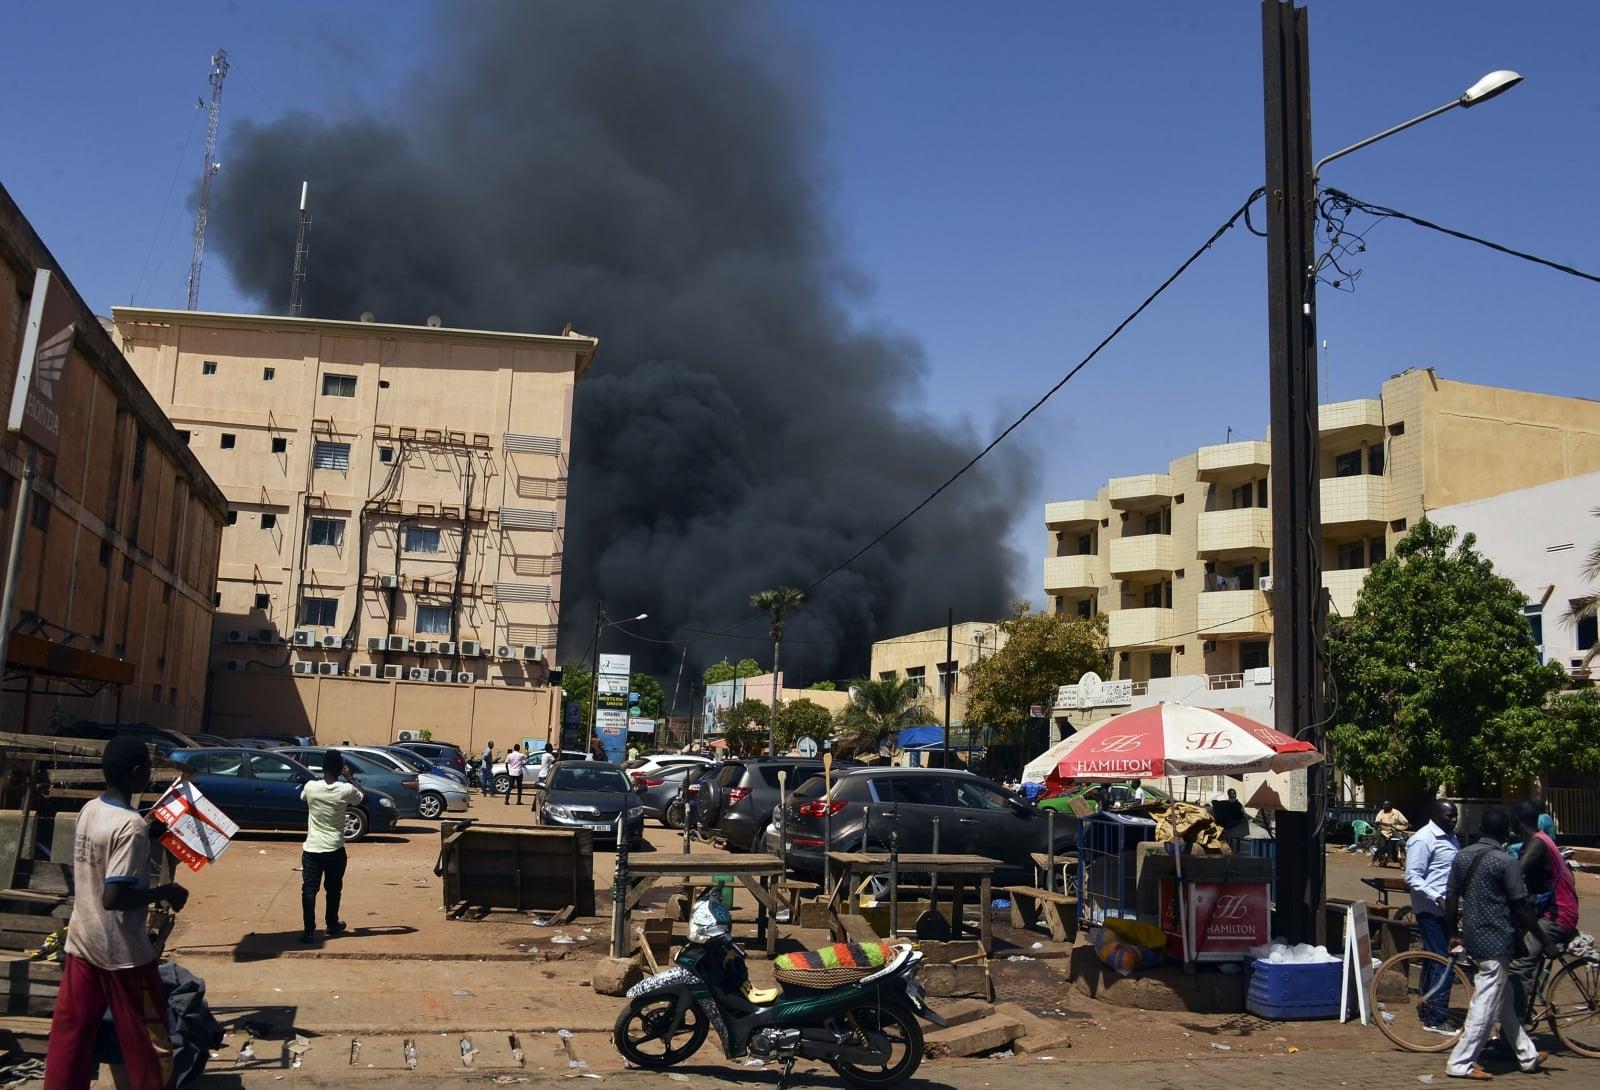 Atak na ambasadę Francji w Burkina Faso EPA/STR